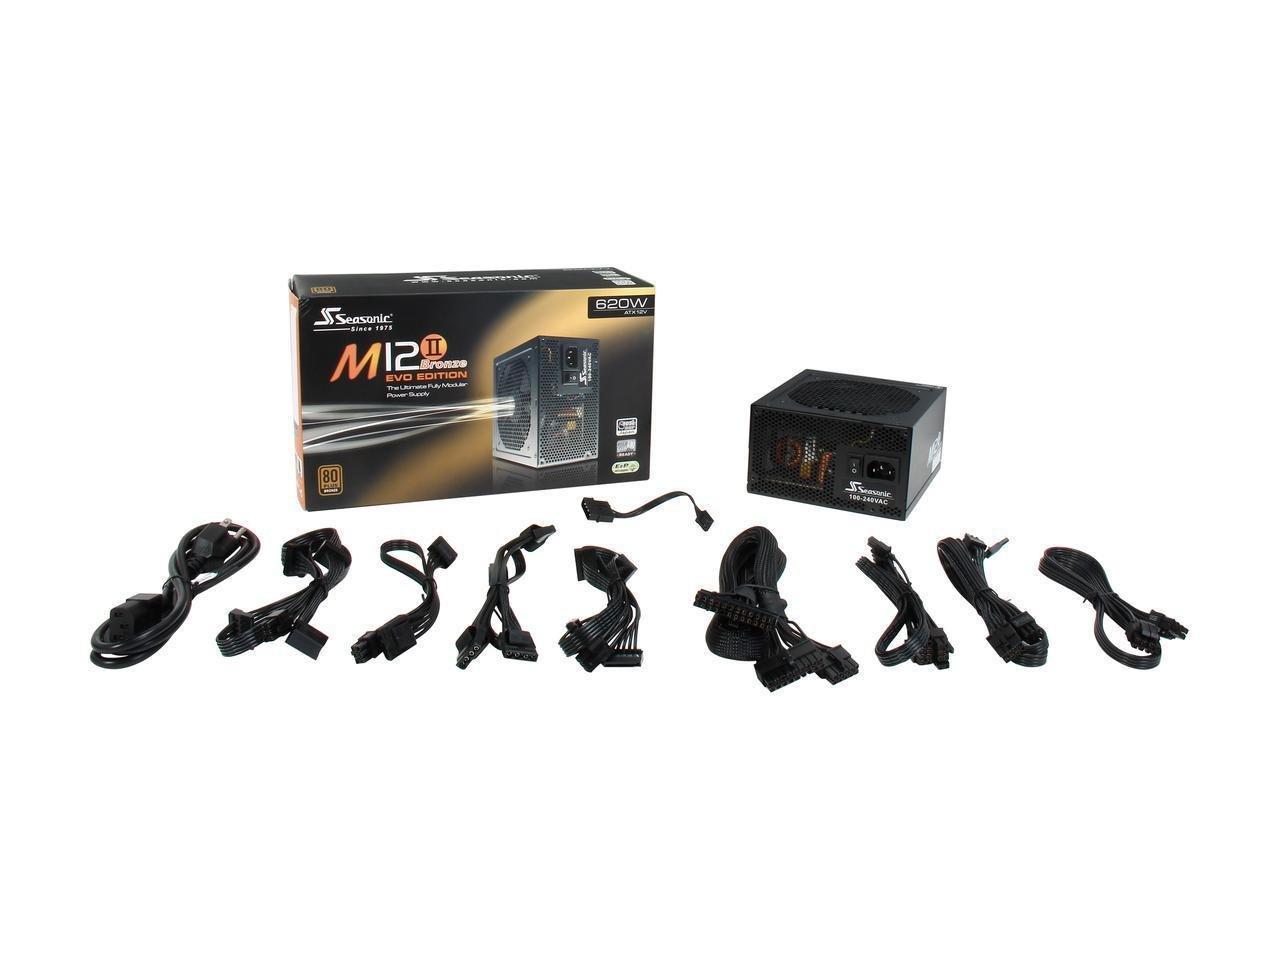 Seasonic M12II EVO 620 SS-620GM2 620W 80+ Bronze EVO Edition ATX12V & EPS12V Full Modular 105 °C Japanese Capacitor 5 Year Warranty Power Supply by Seasonic (Image #6)